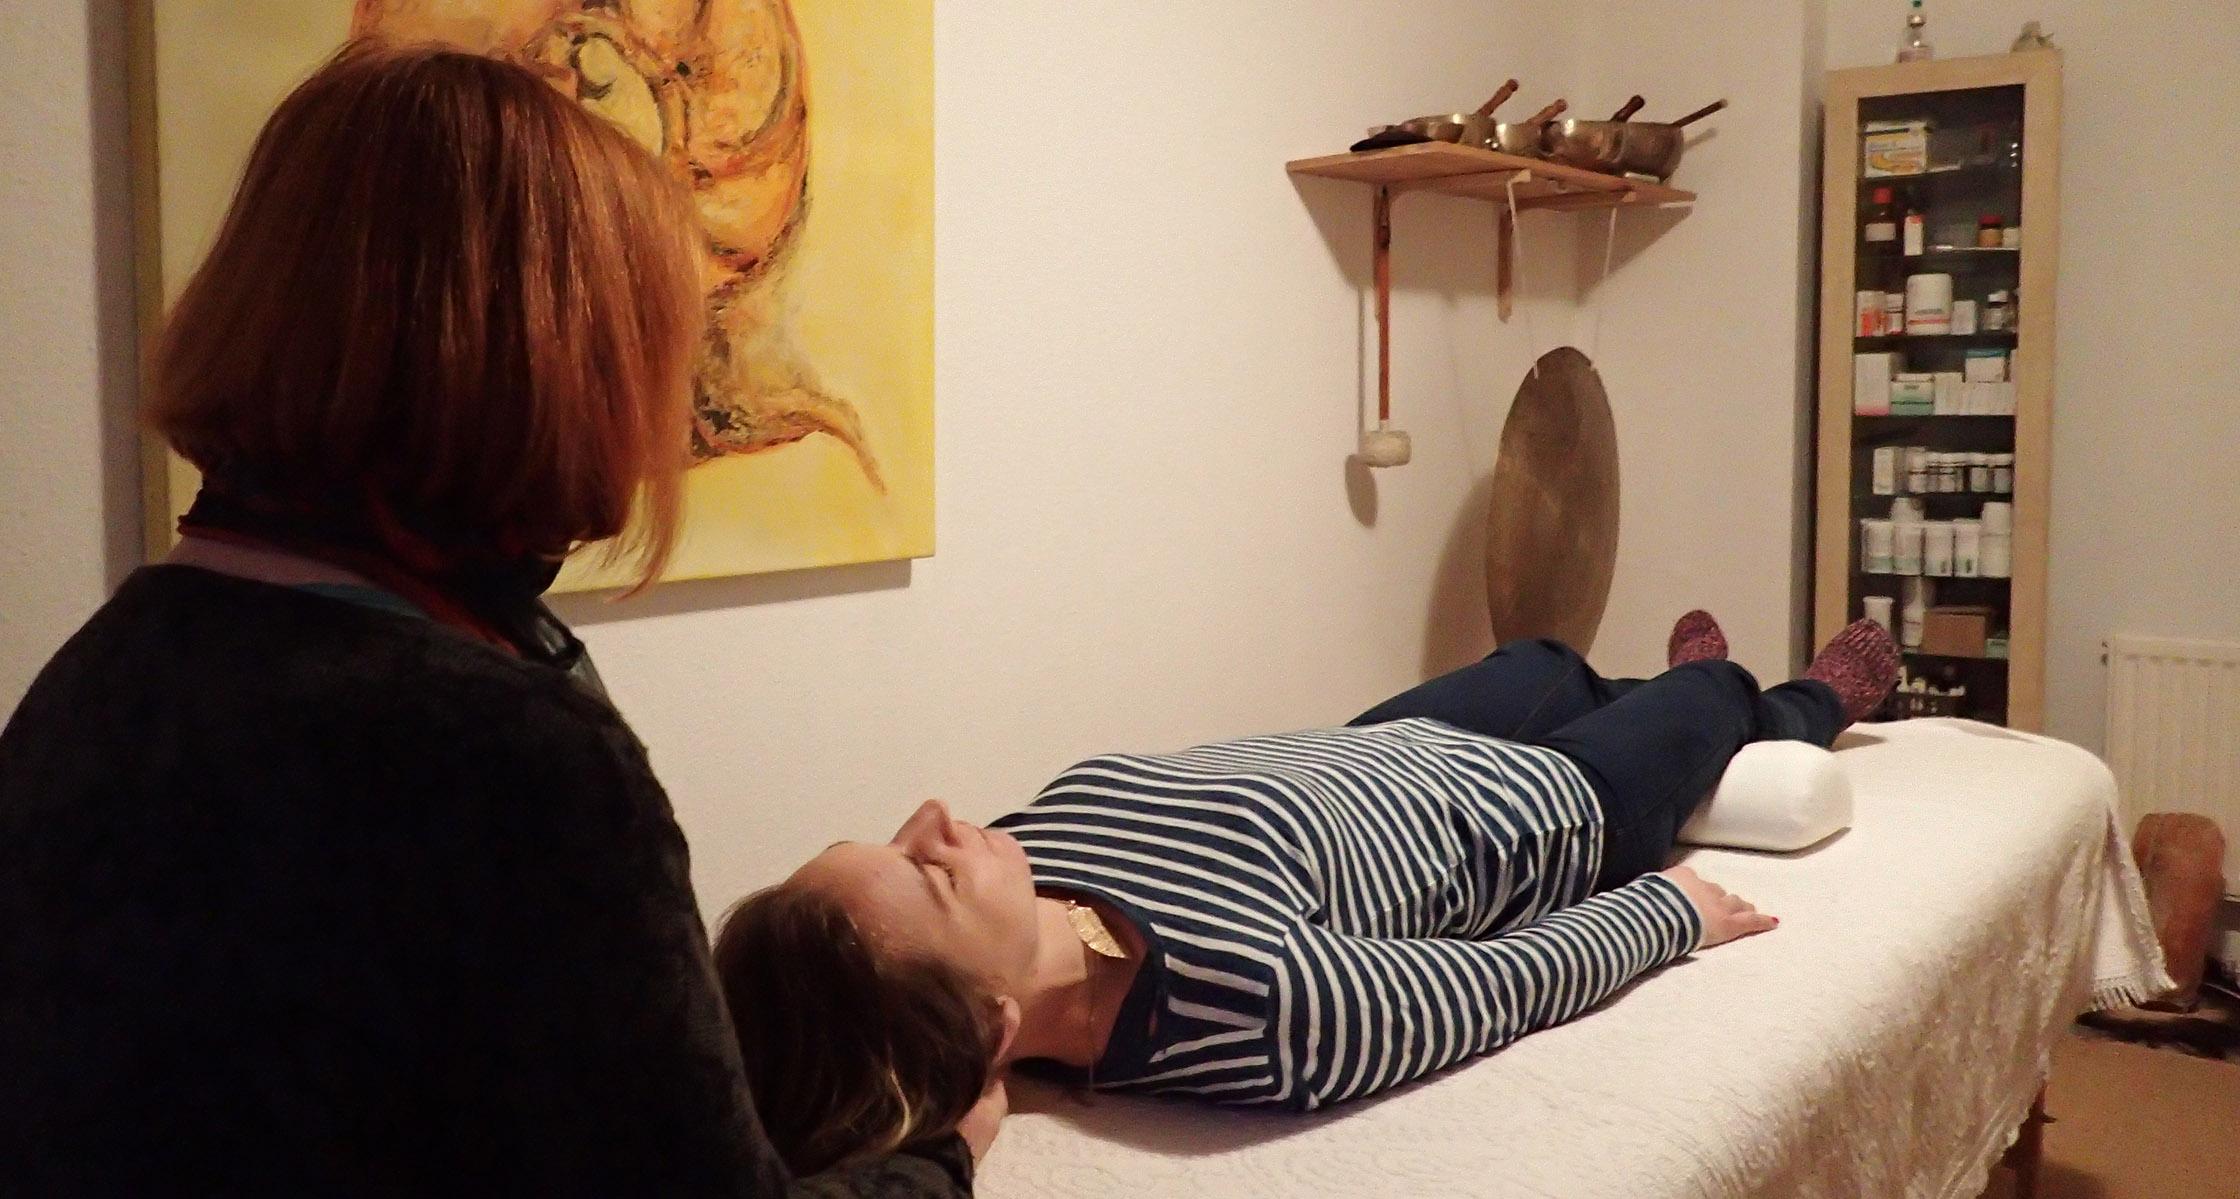 Behandlungen, osteopathische Behandlung